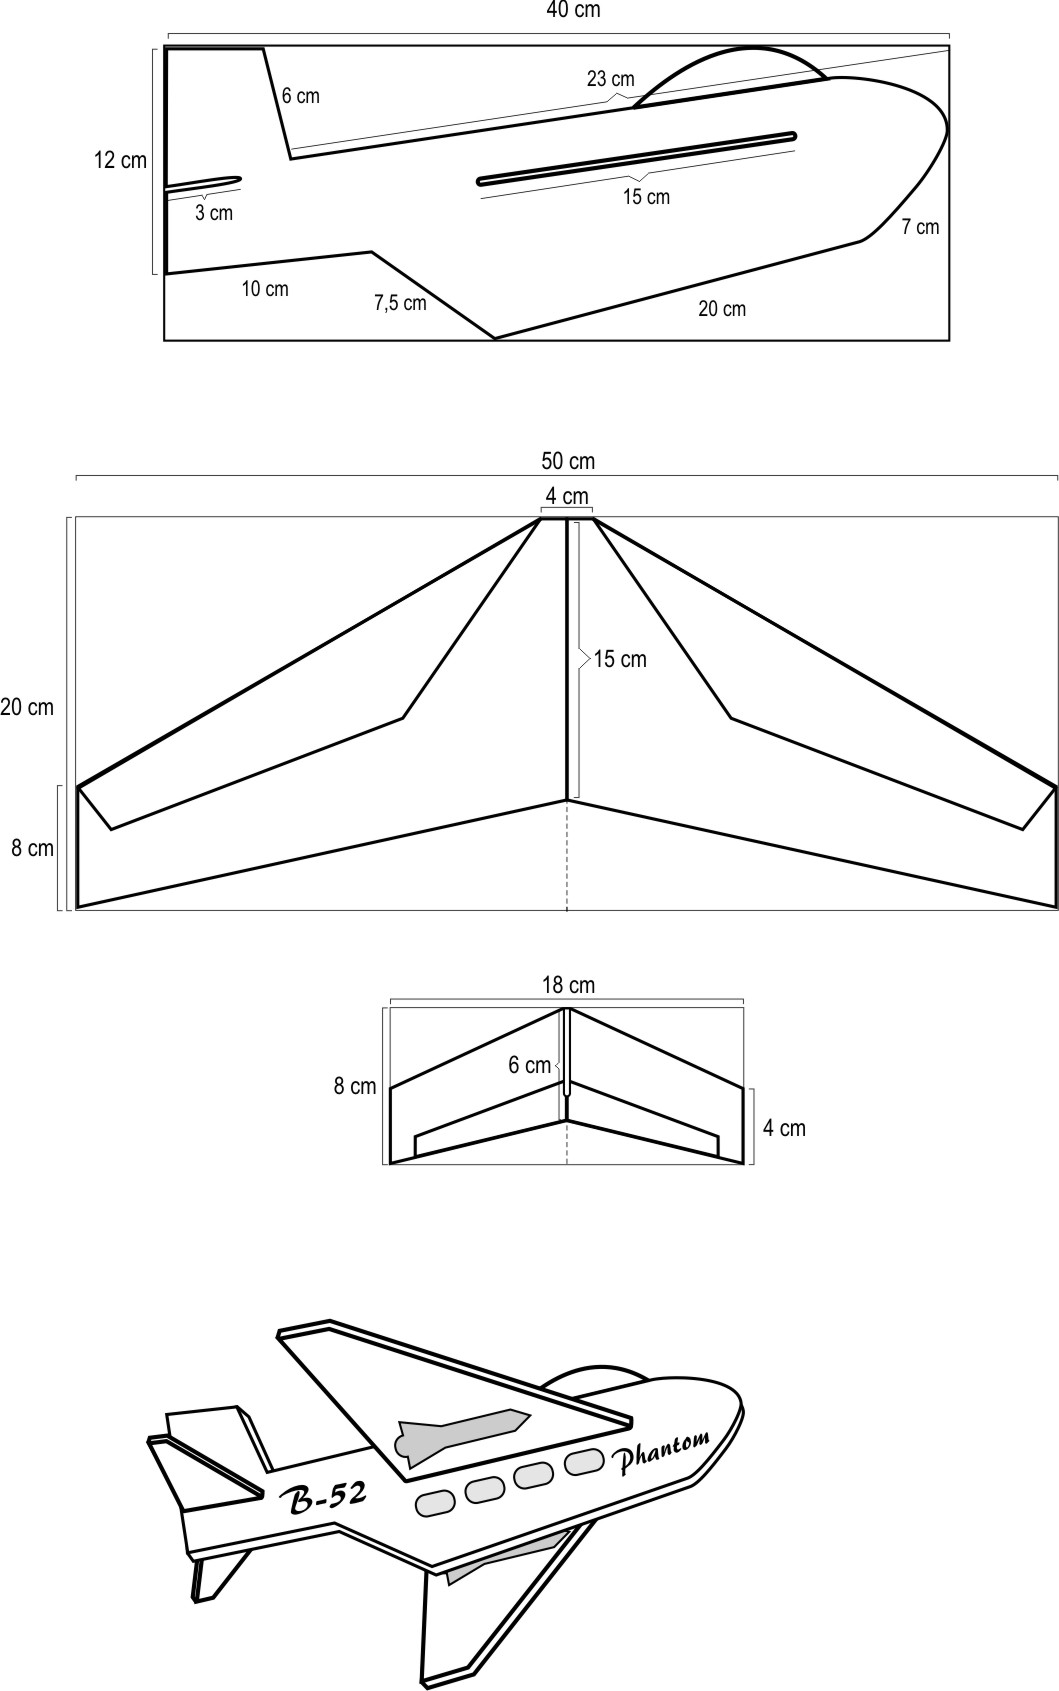 Ukuran Layang Layang : ukuran, layang, Membuat, Layang-layang, Pesawat, Tempur, BLIMBING, MALANG